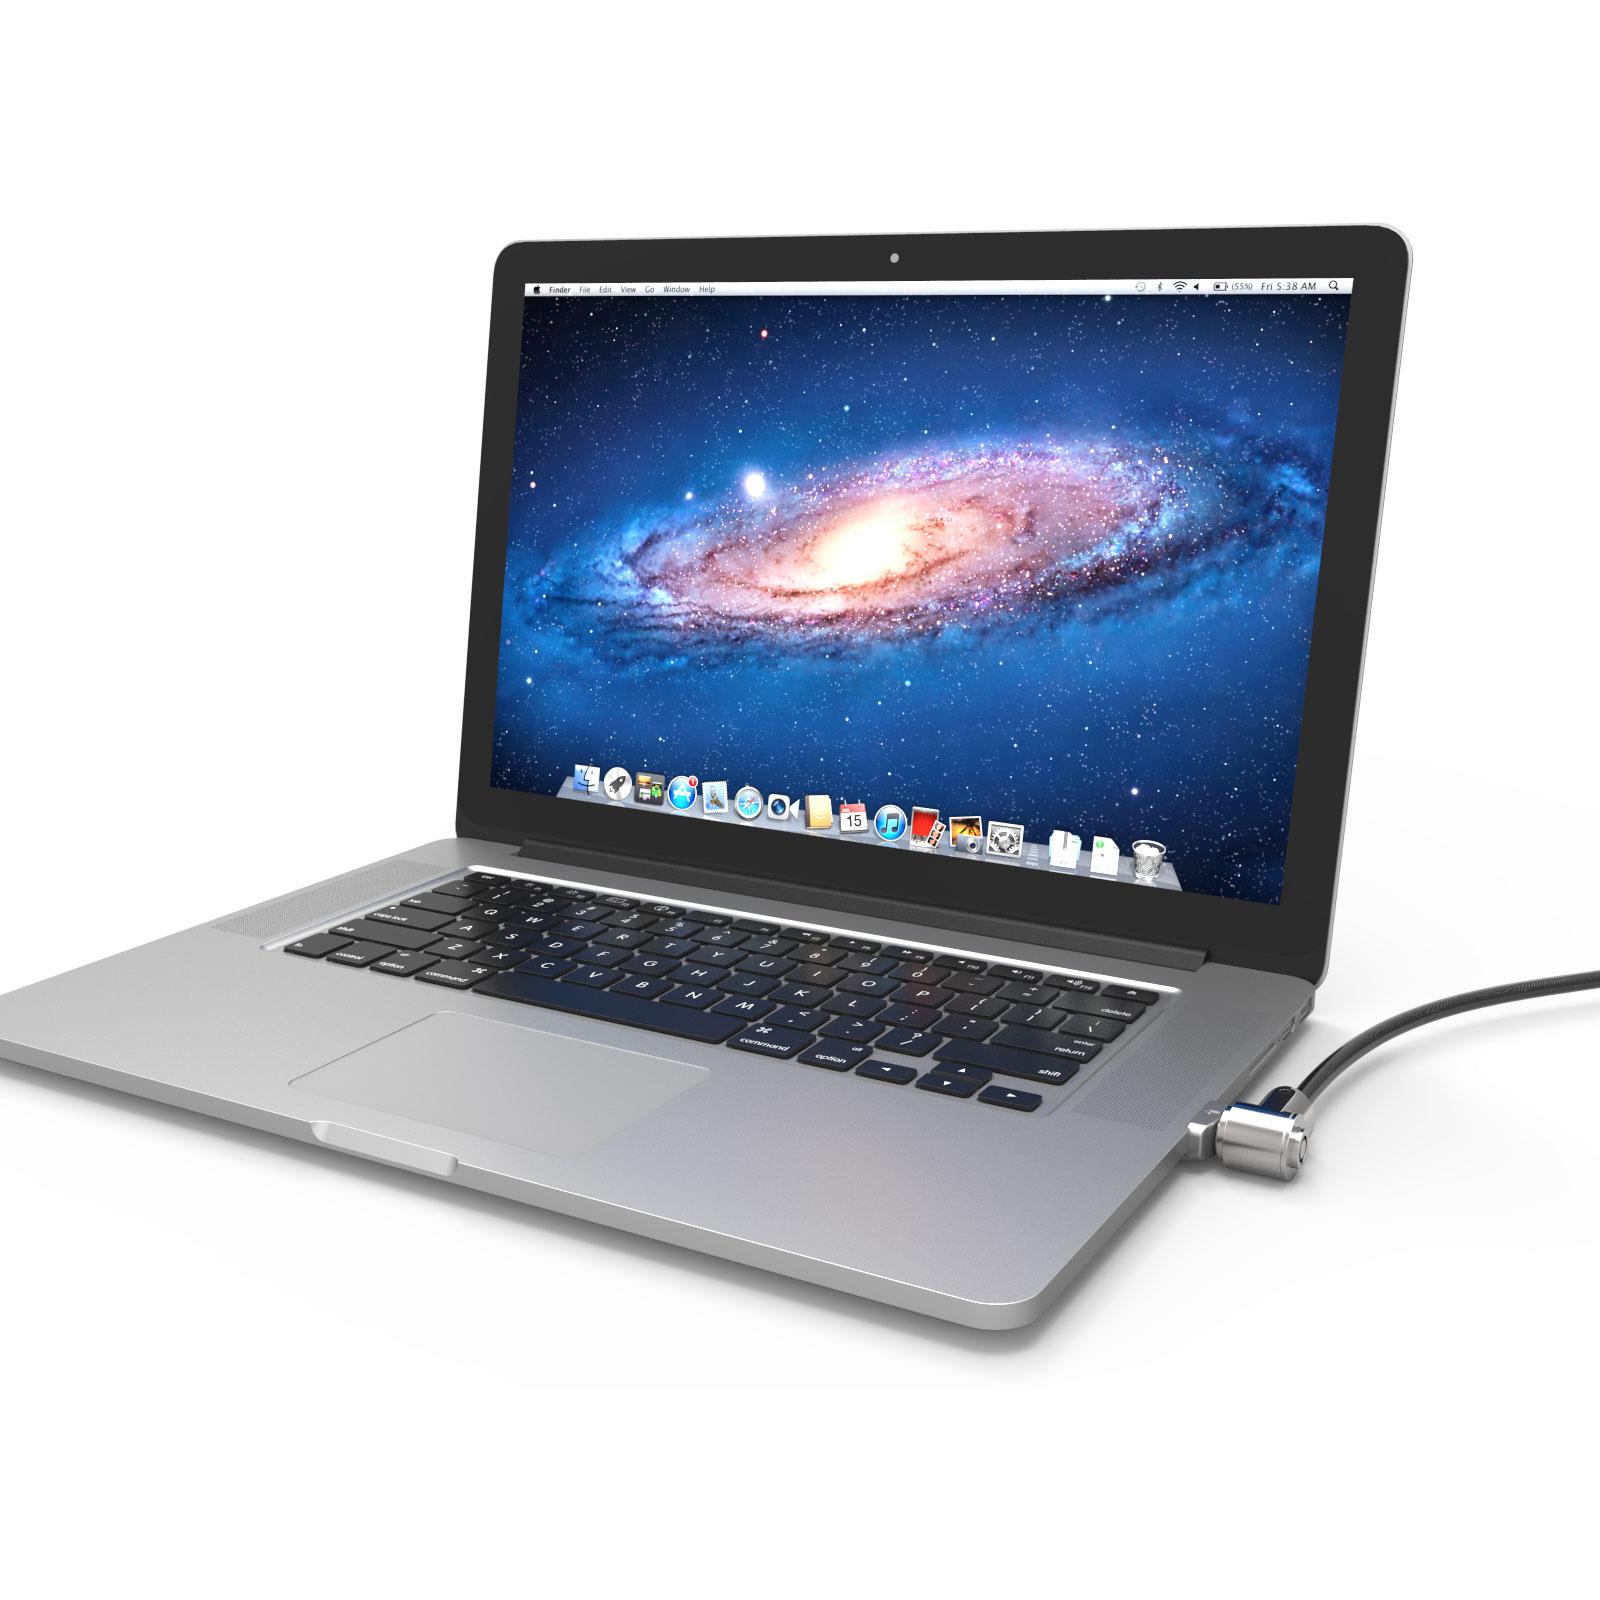 maclocks the ledge macbook air keyed cable mbaldg01kl. Black Bedroom Furniture Sets. Home Design Ideas